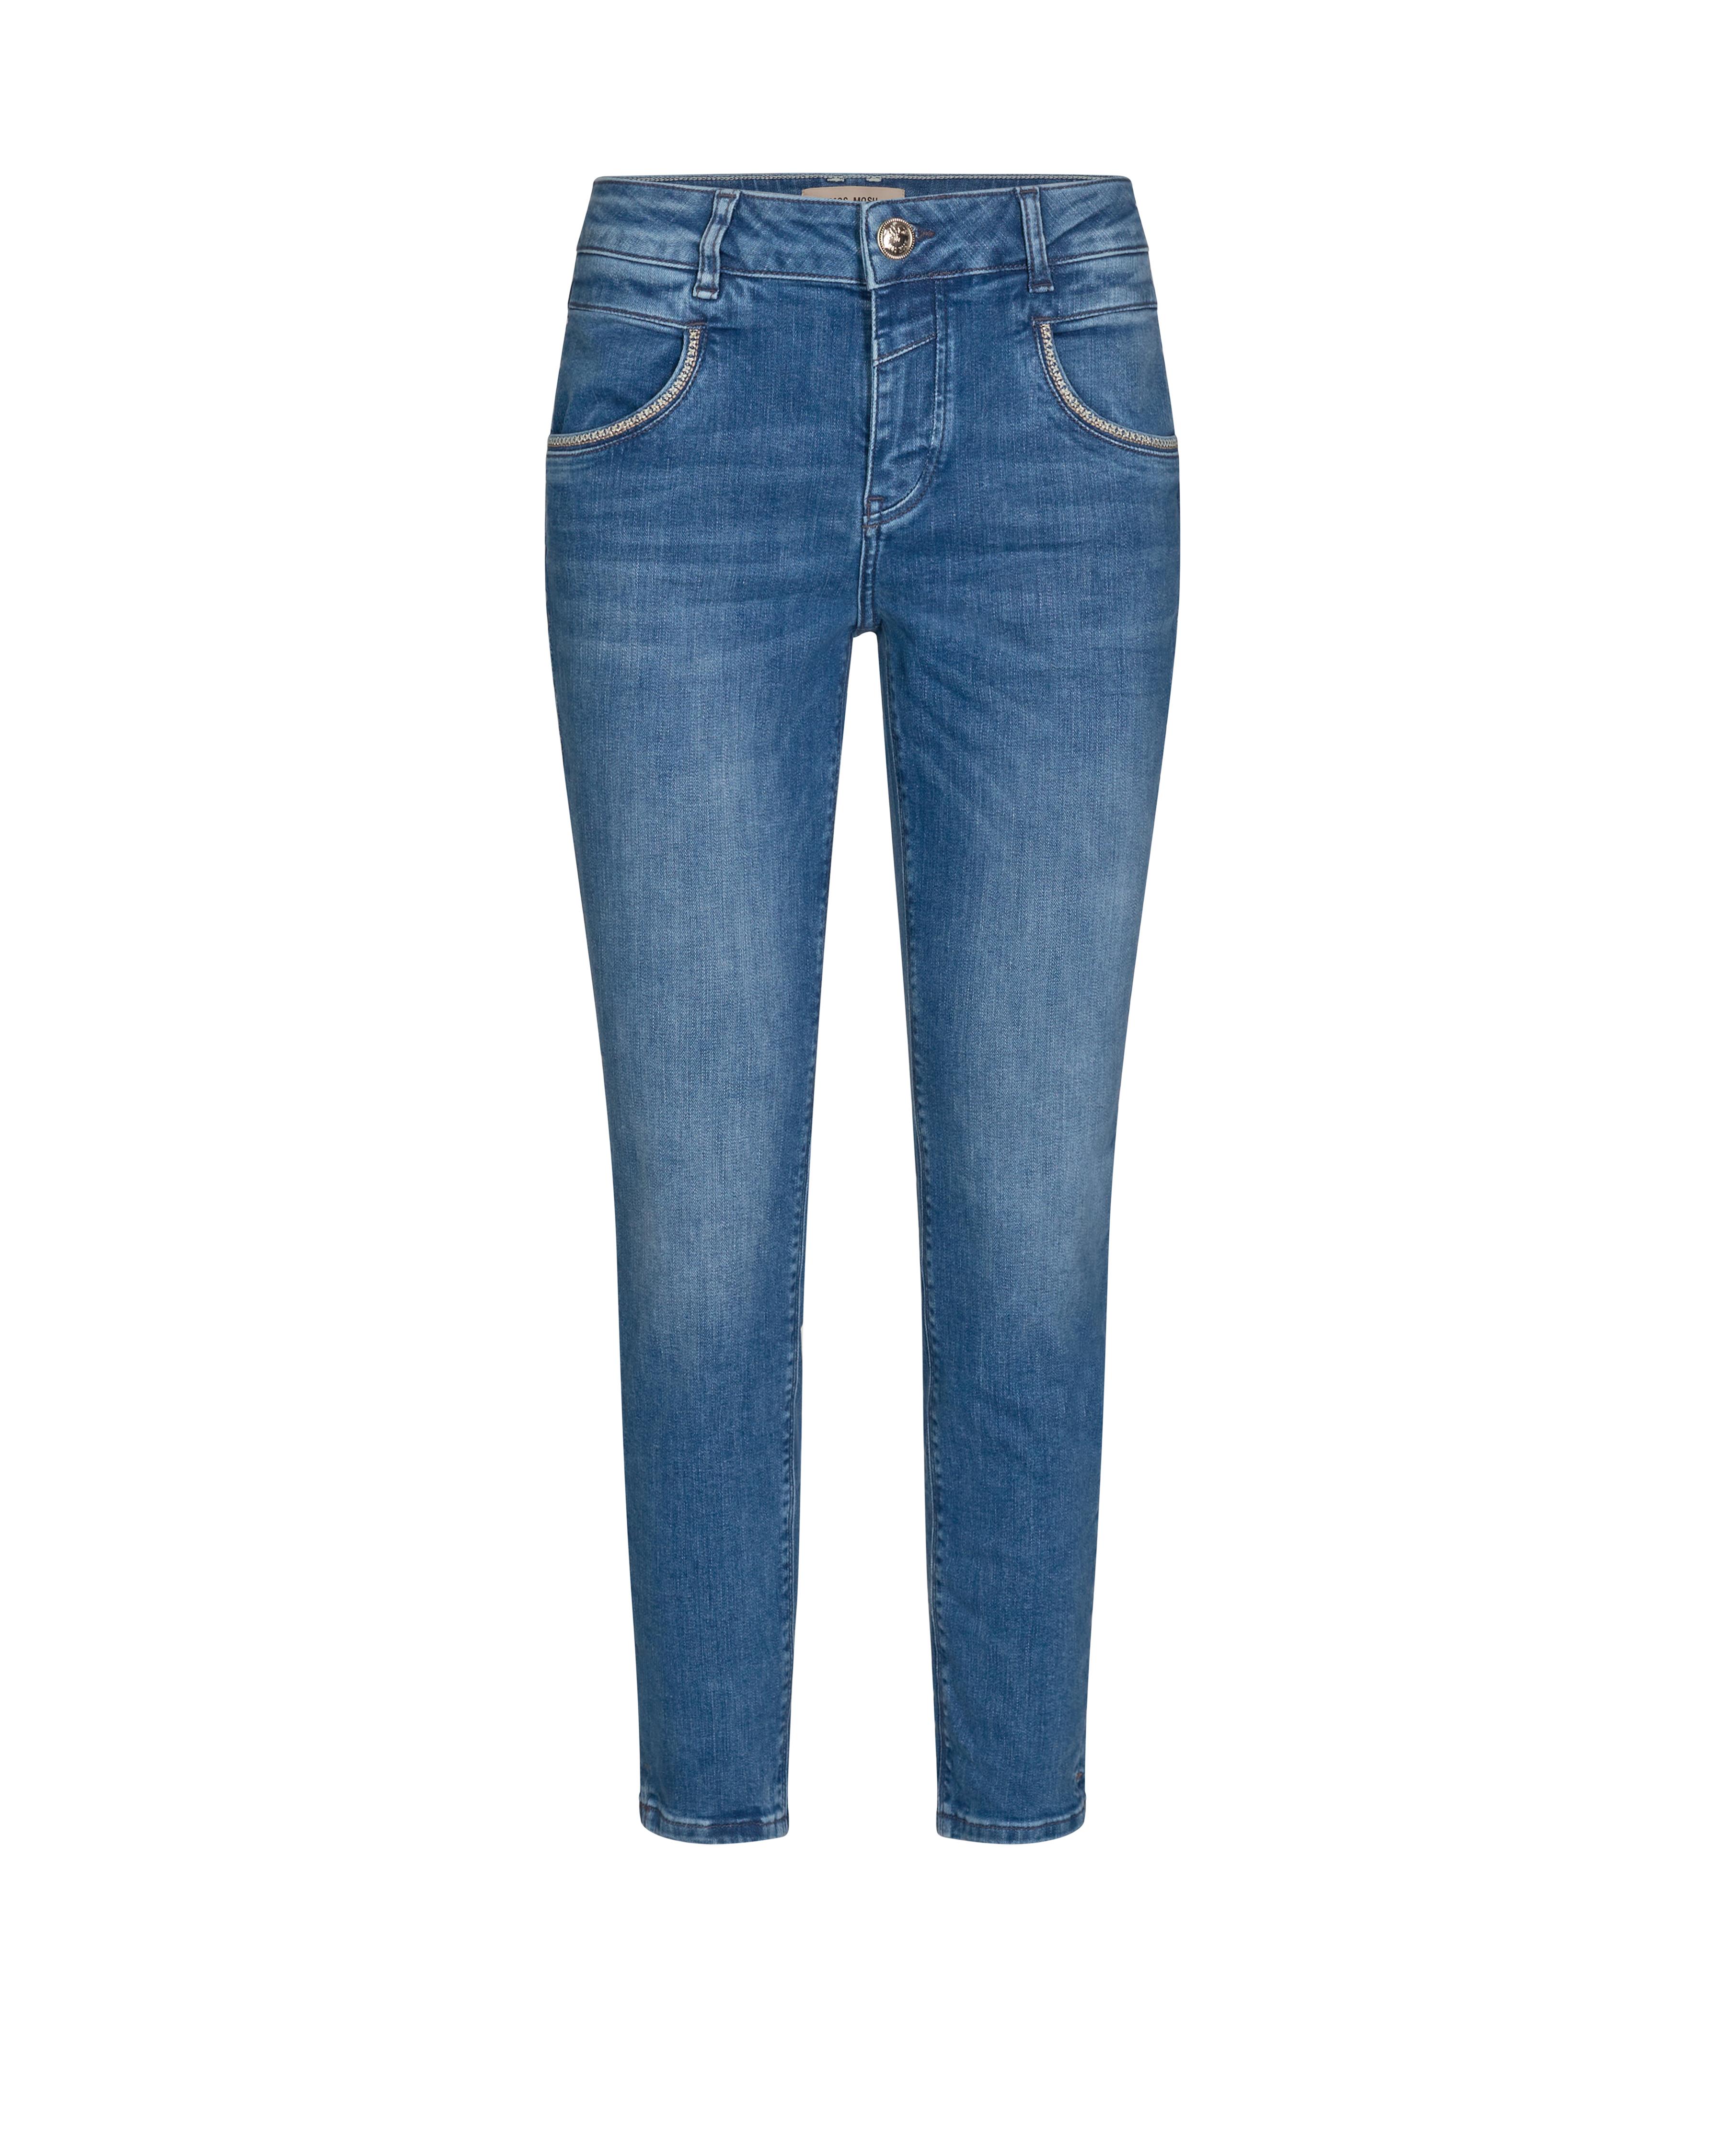 Mos Mosh Naomi Gloss jeans, blue, 31